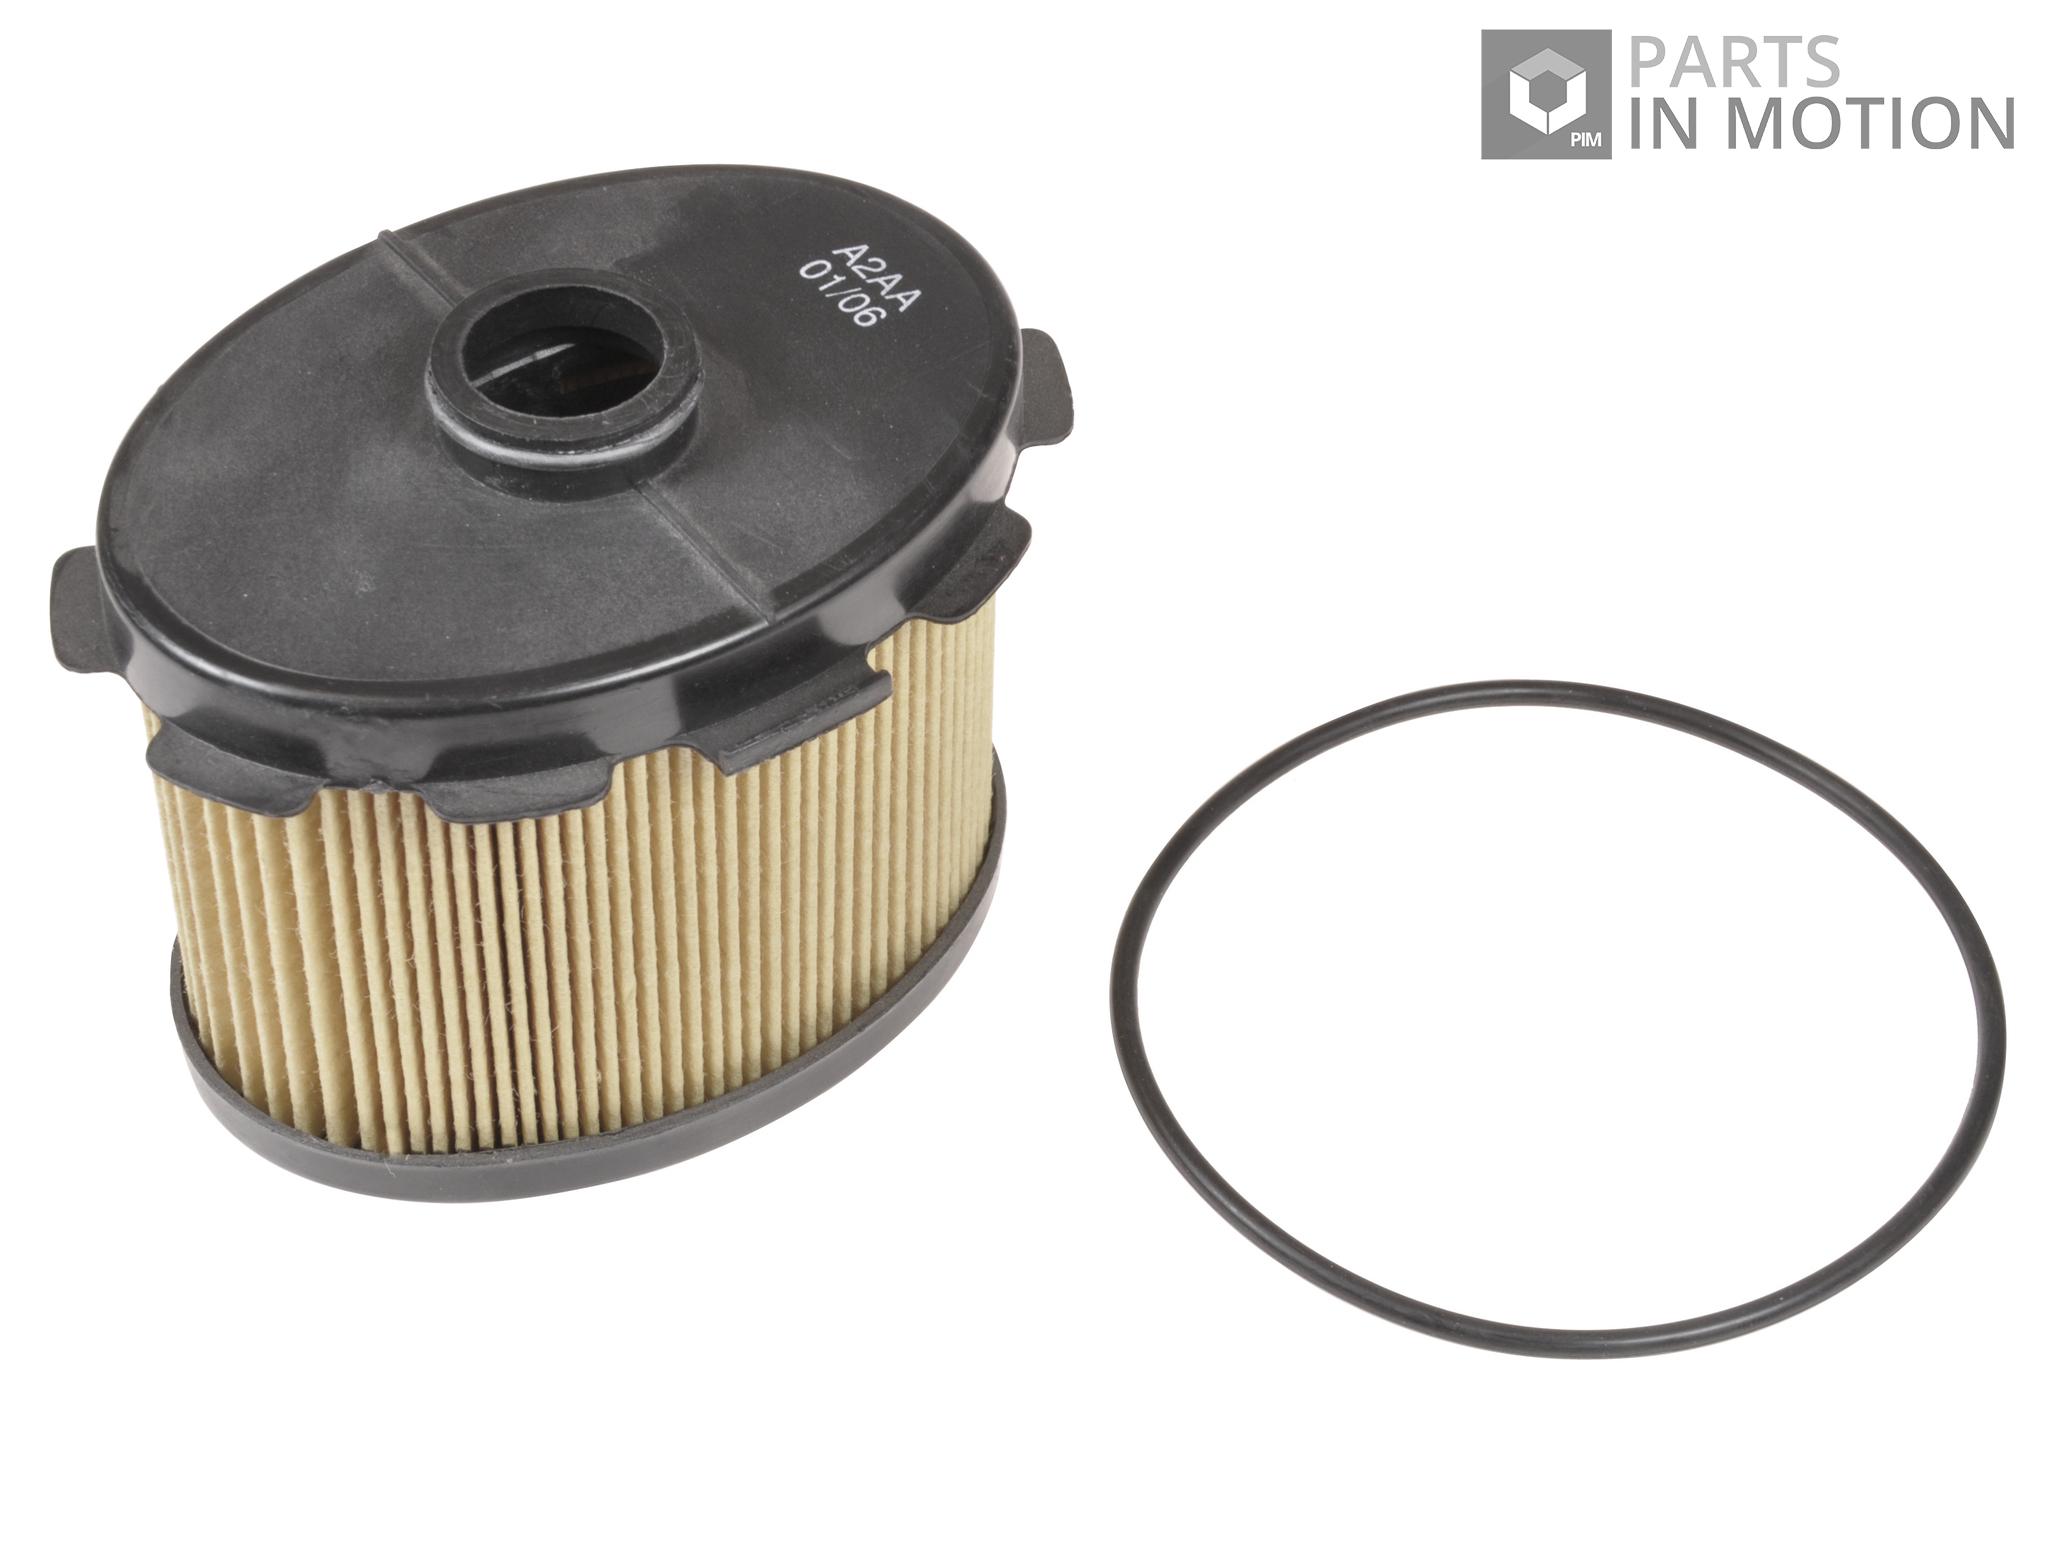 Citroen Xsara N0 1.9 D Genuine Fram Fuel Filter Service Replacement